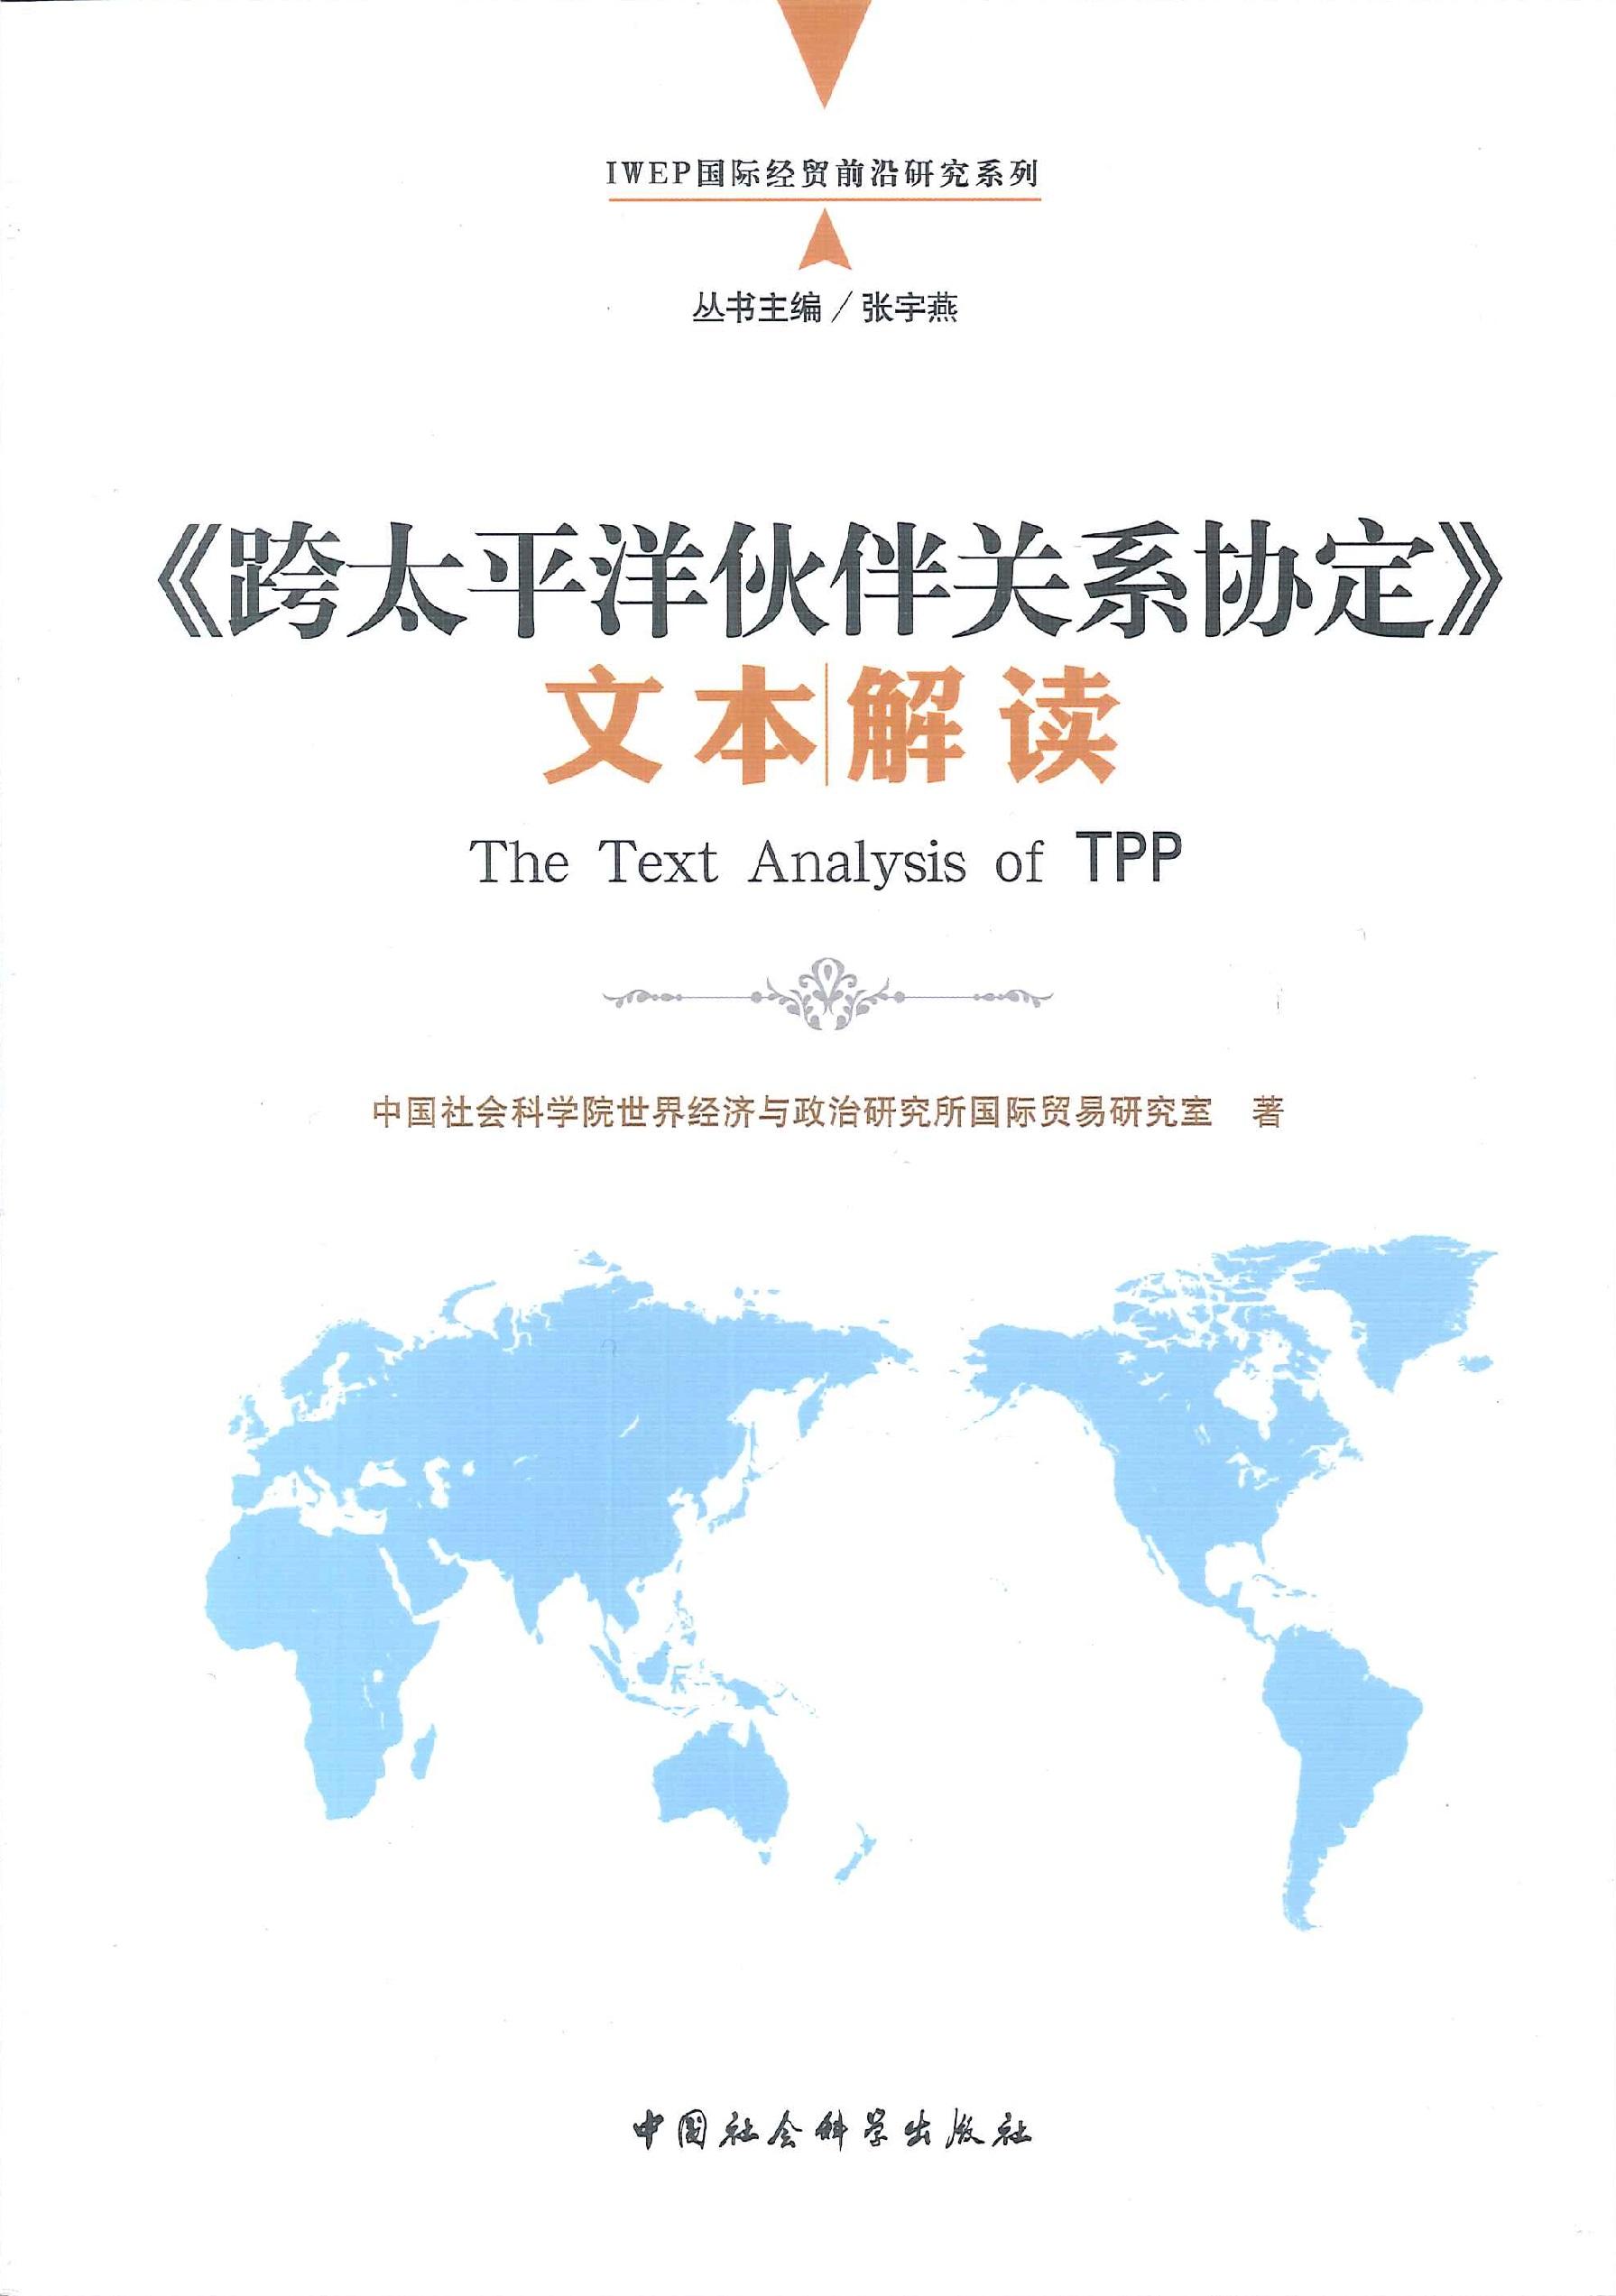 《跨太平洋伙伴关系协定》文本解读=The text analysis of TPP